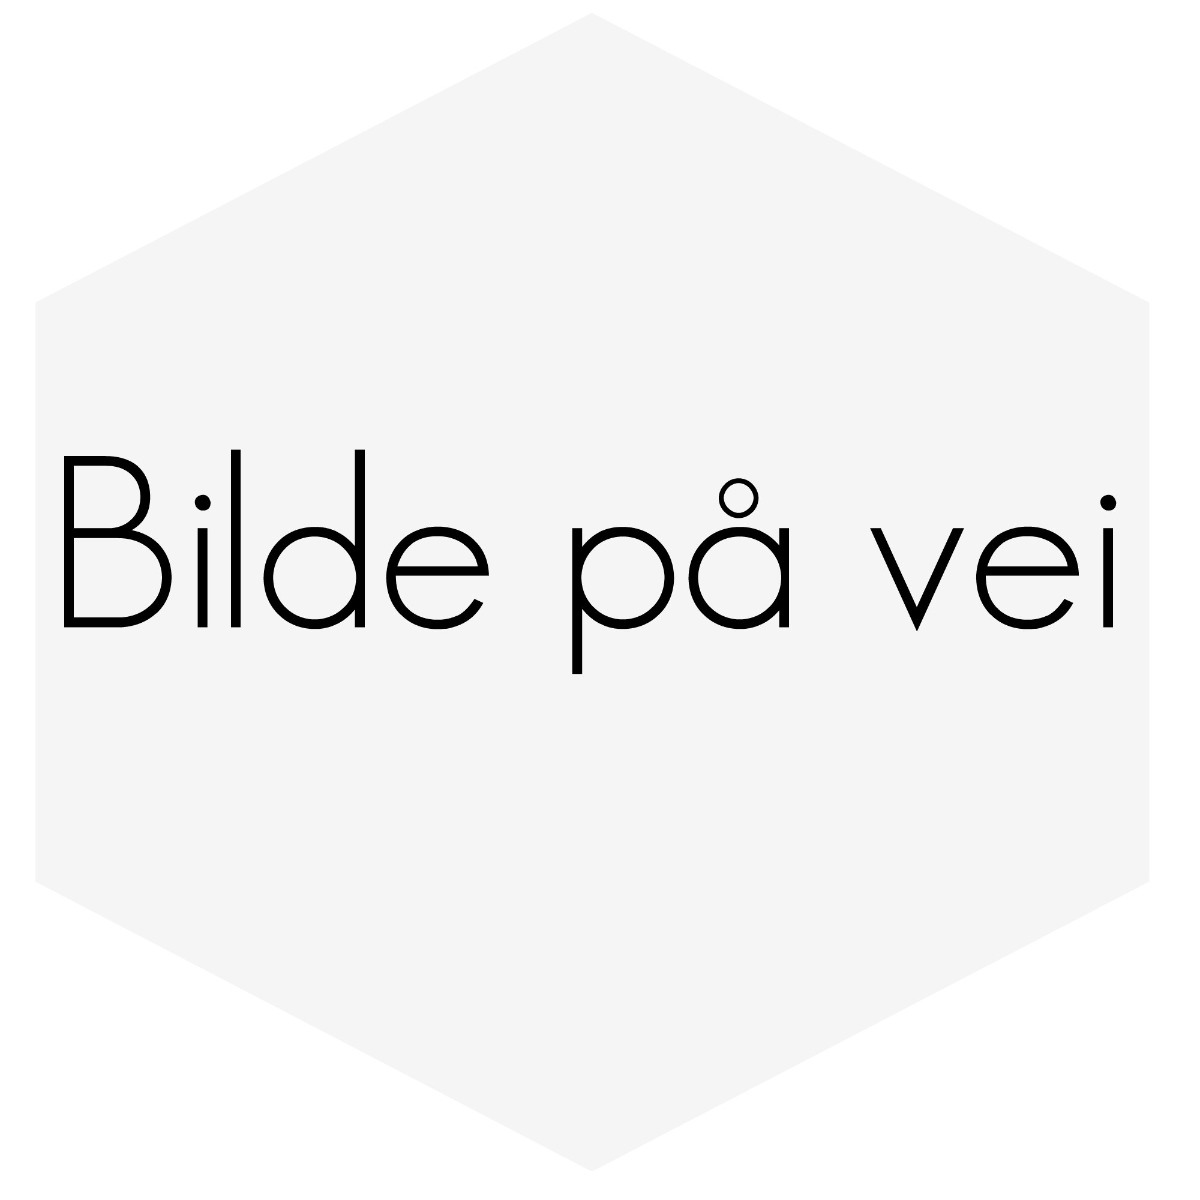 PANSER LÅSPINNE SATS